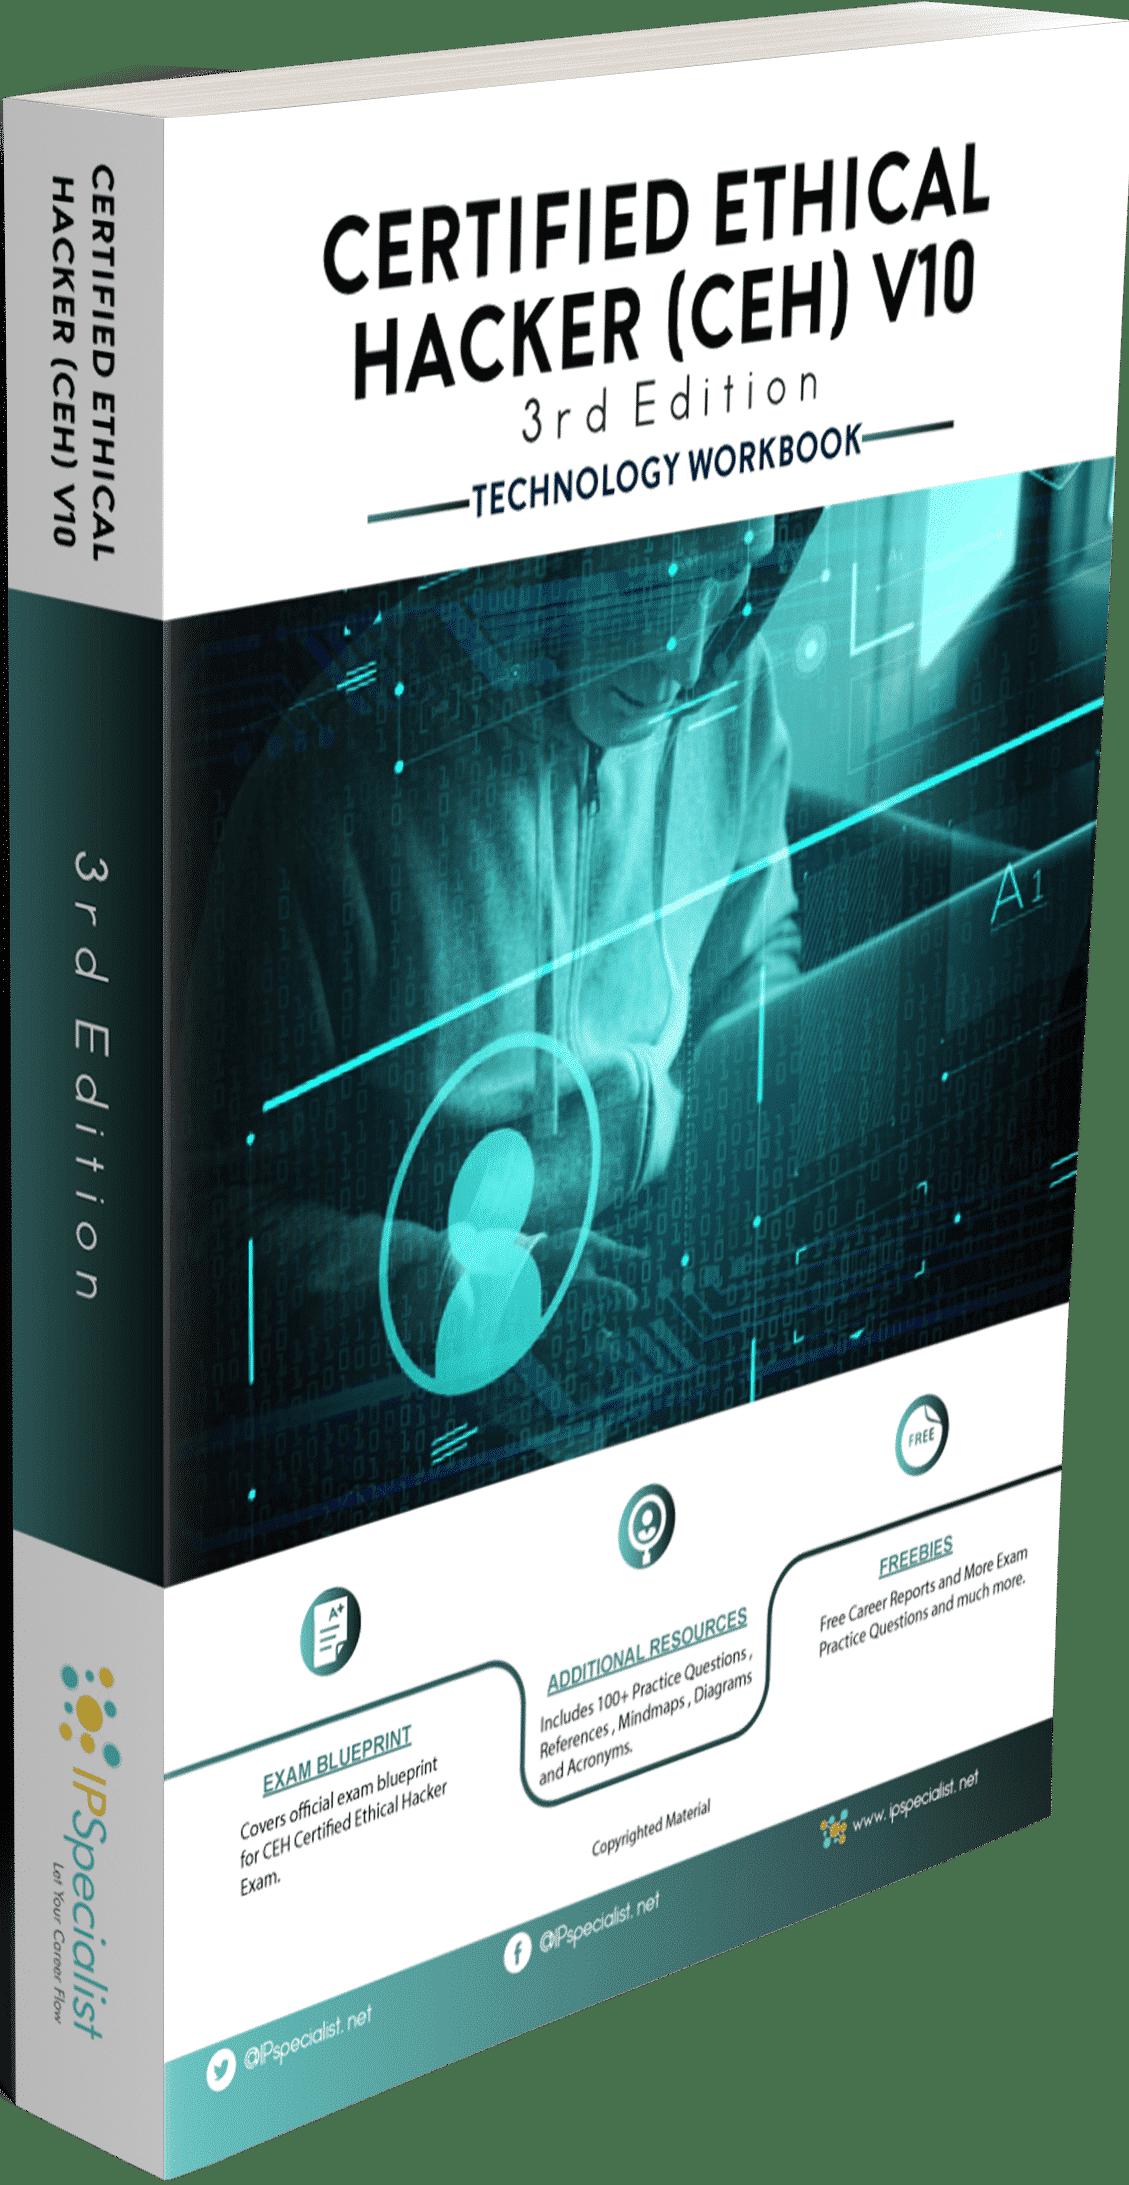 IPSpecialist: Online IT Training Content & Certification